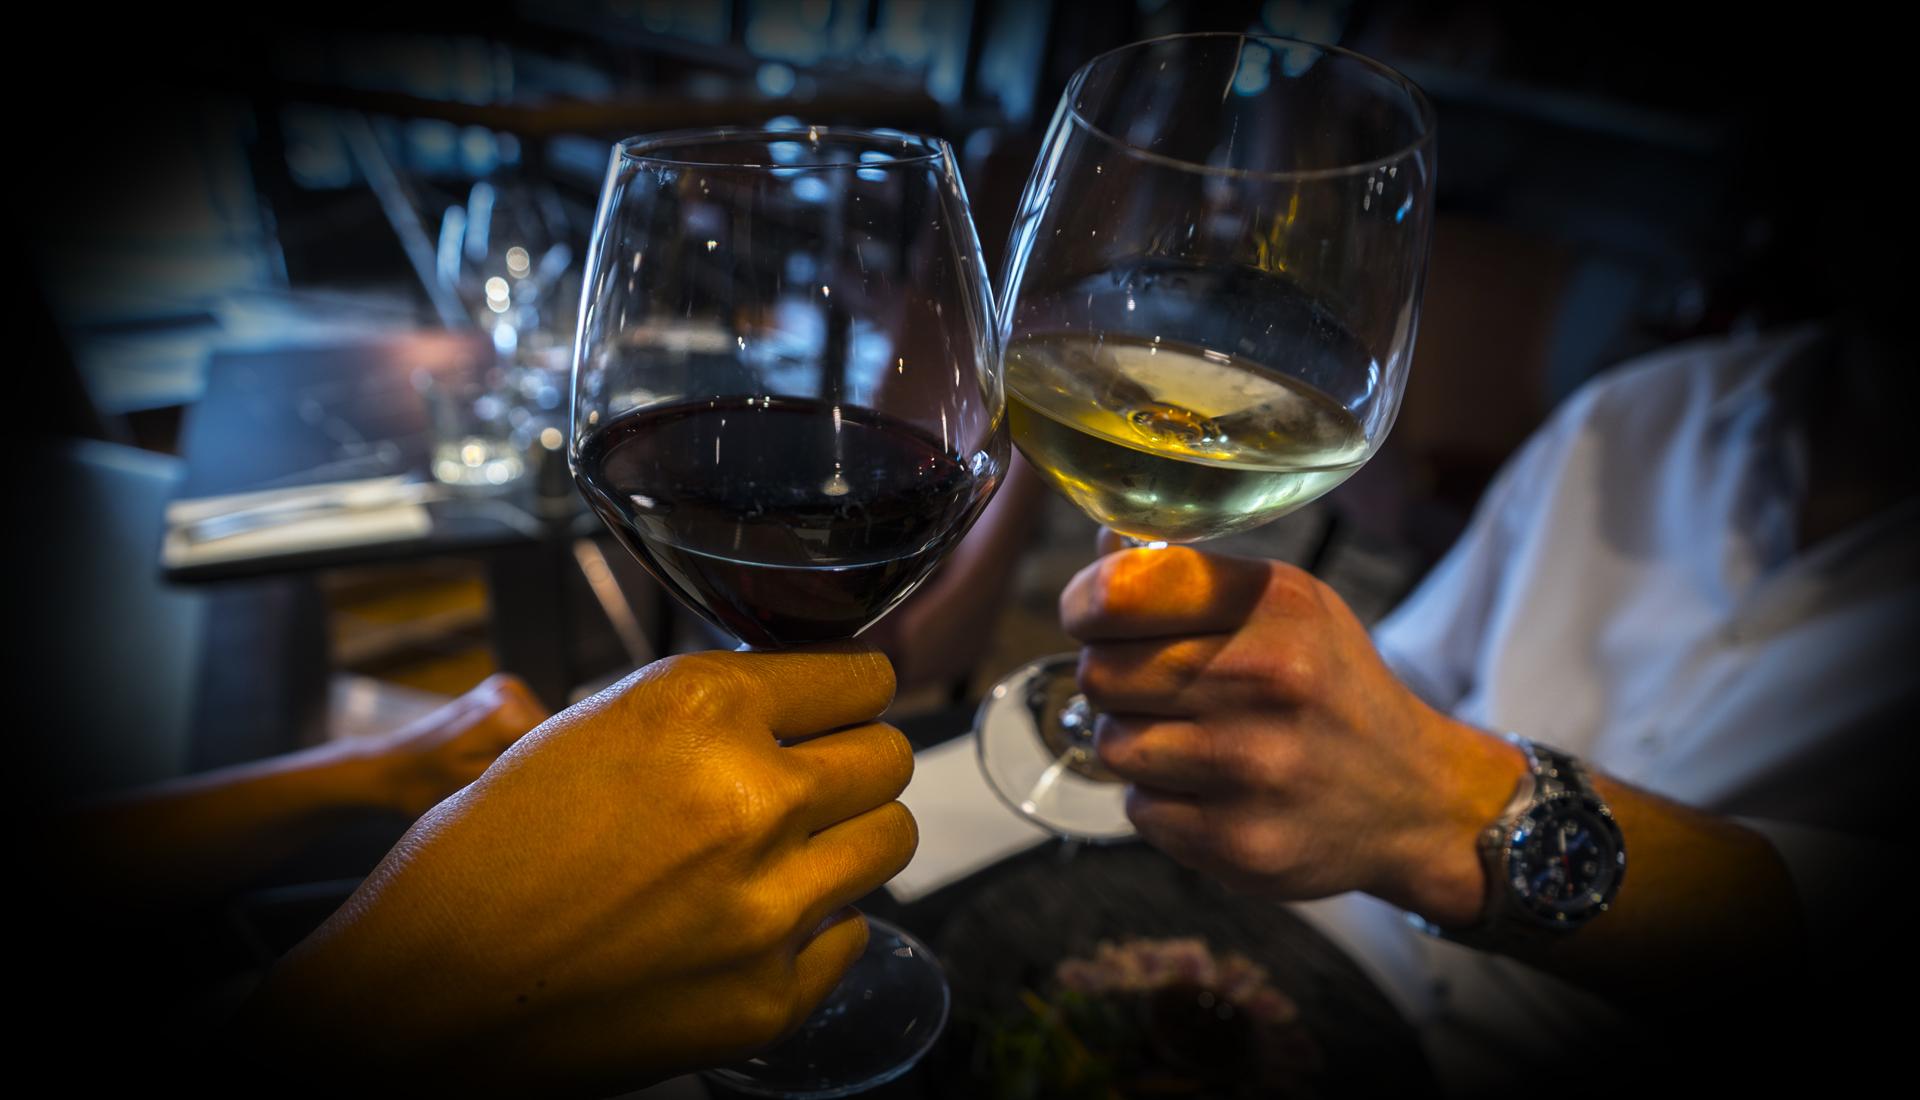 Le Cabana vins au verre Angoulême